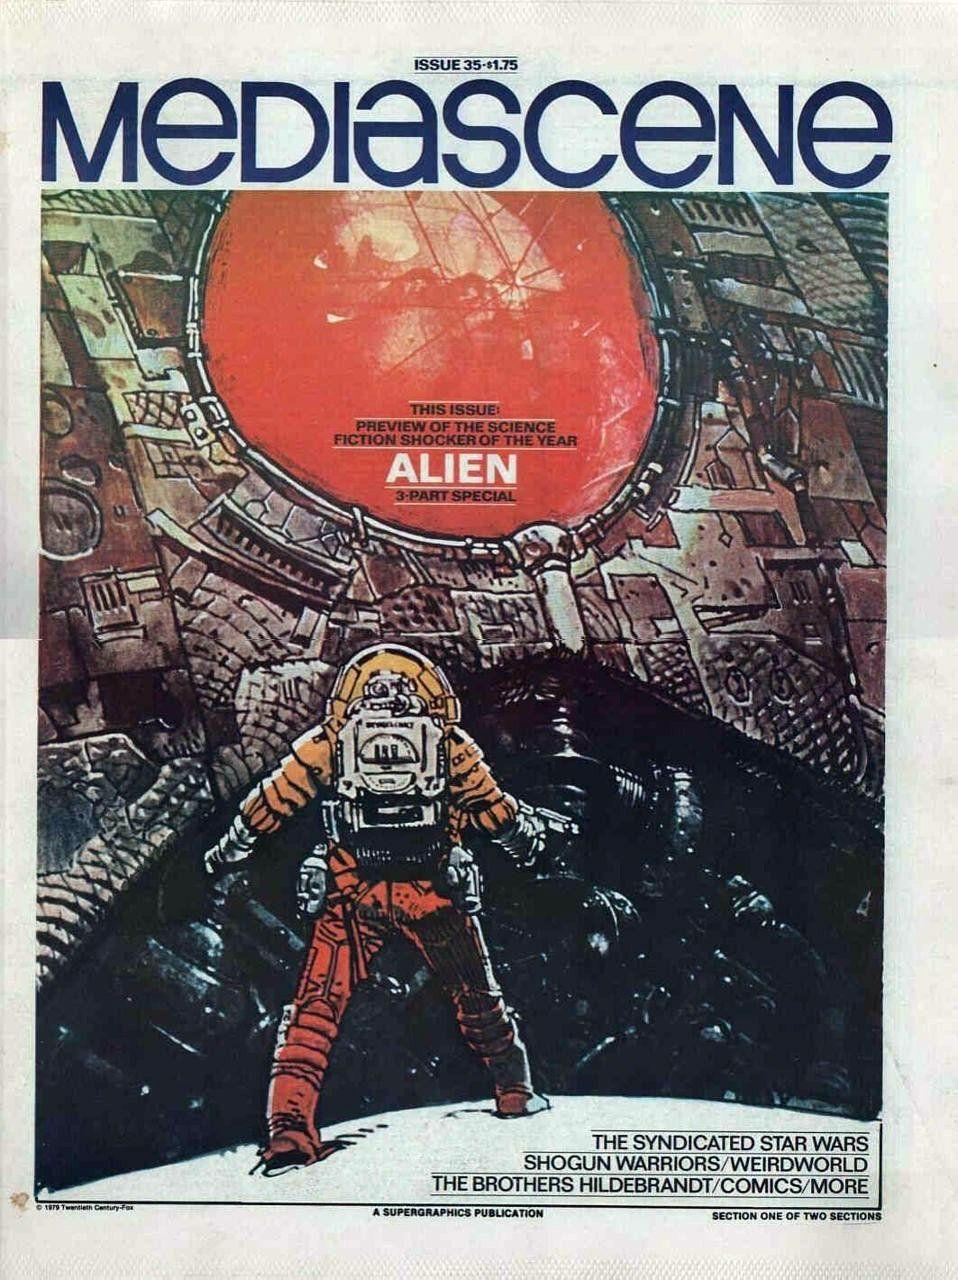 Alien 1979 Movie Art Ellen Ripley Sigourney Weaver FRAMED CANVAS PRINT Toile